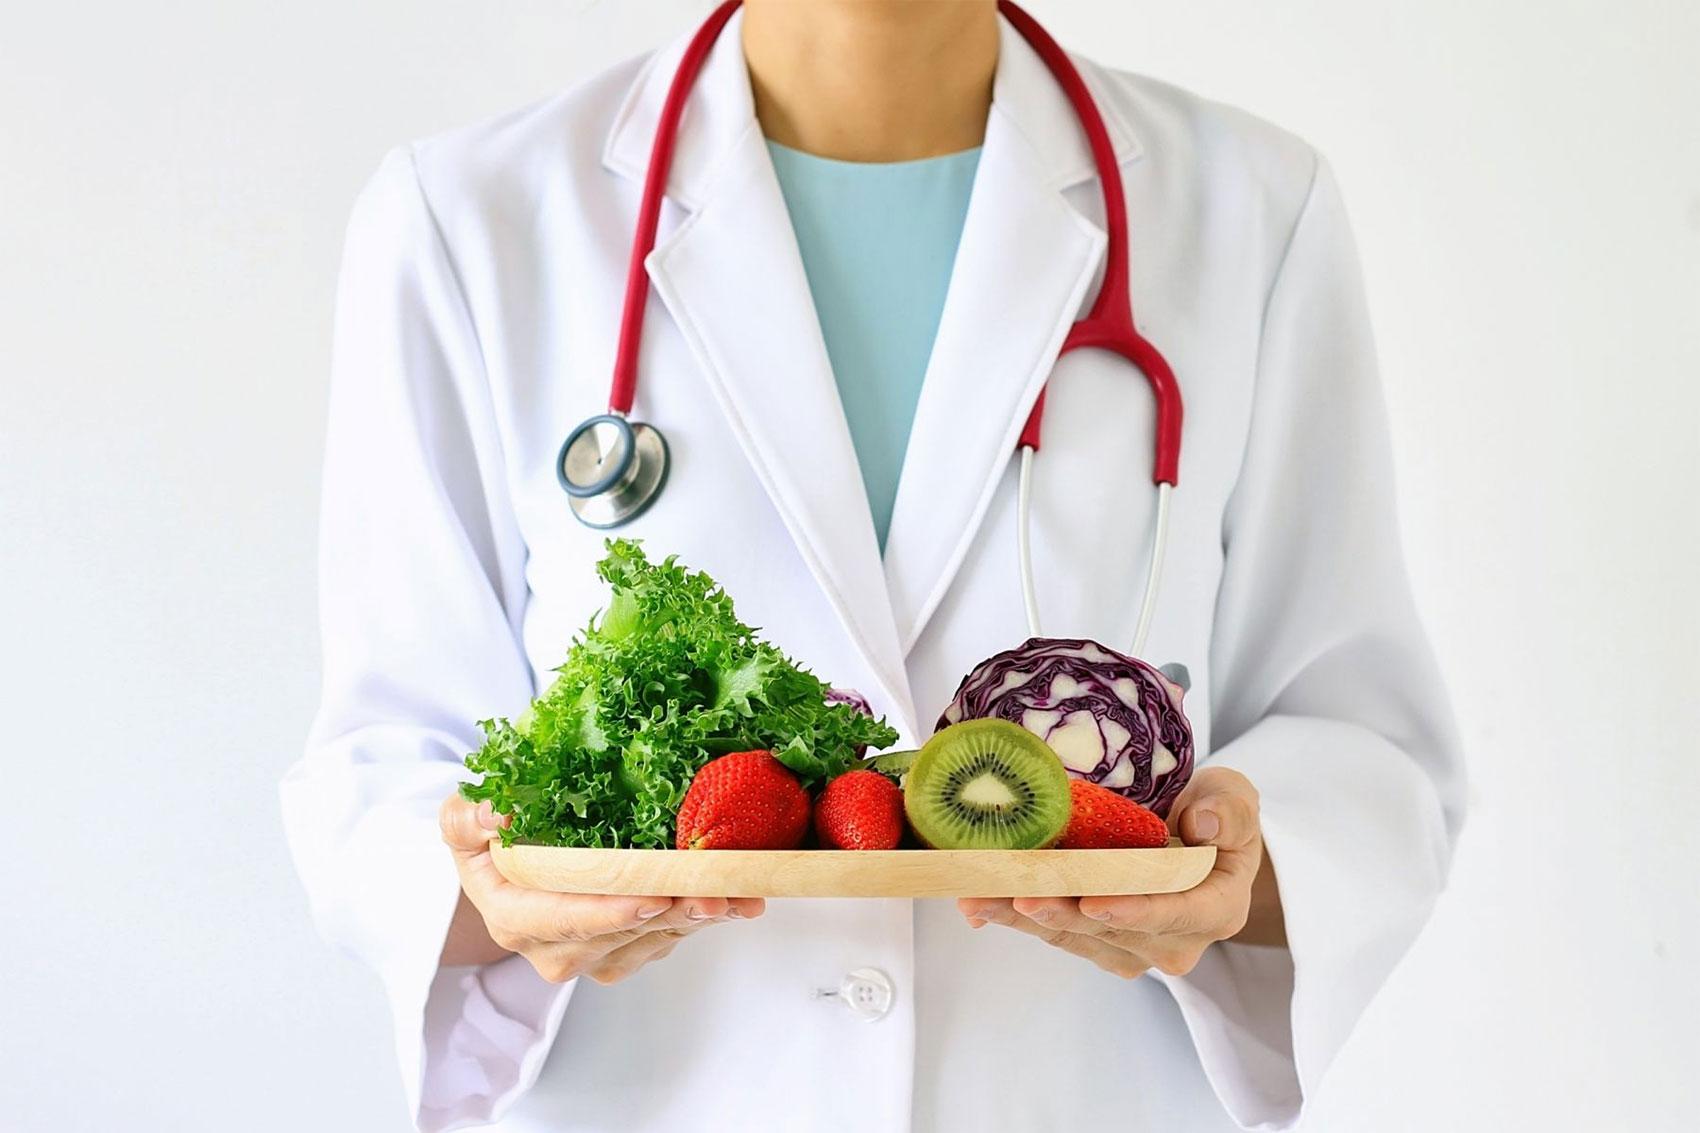 Doctor holding fresh fruit and vegetables